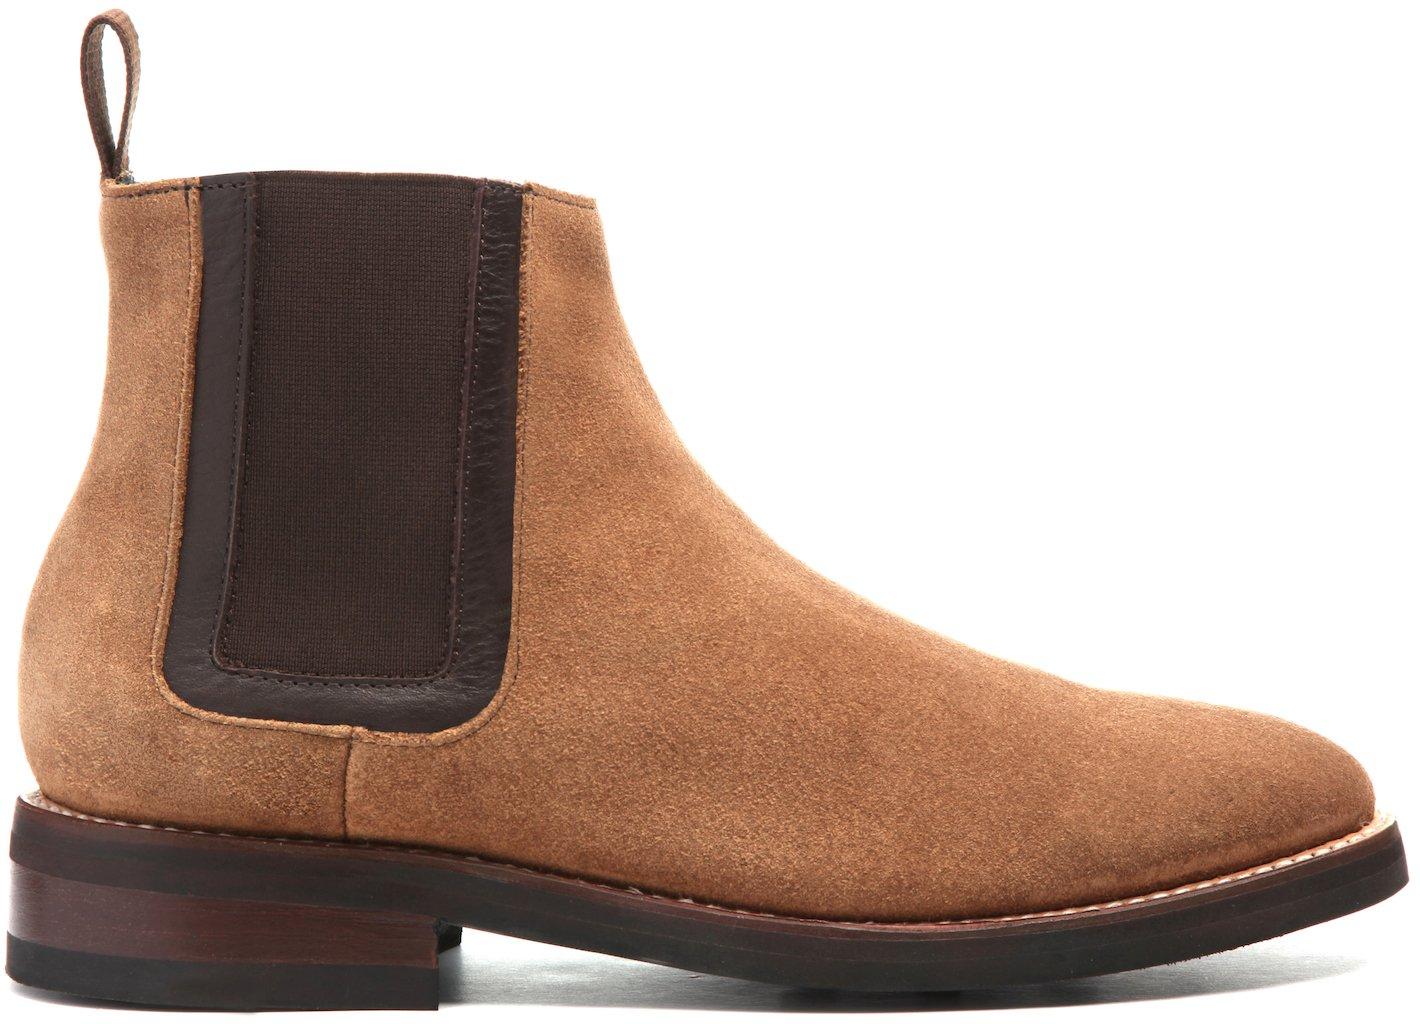 Bottines Bottines Chelsea De Thursday Boot Boot Company Duke Pour